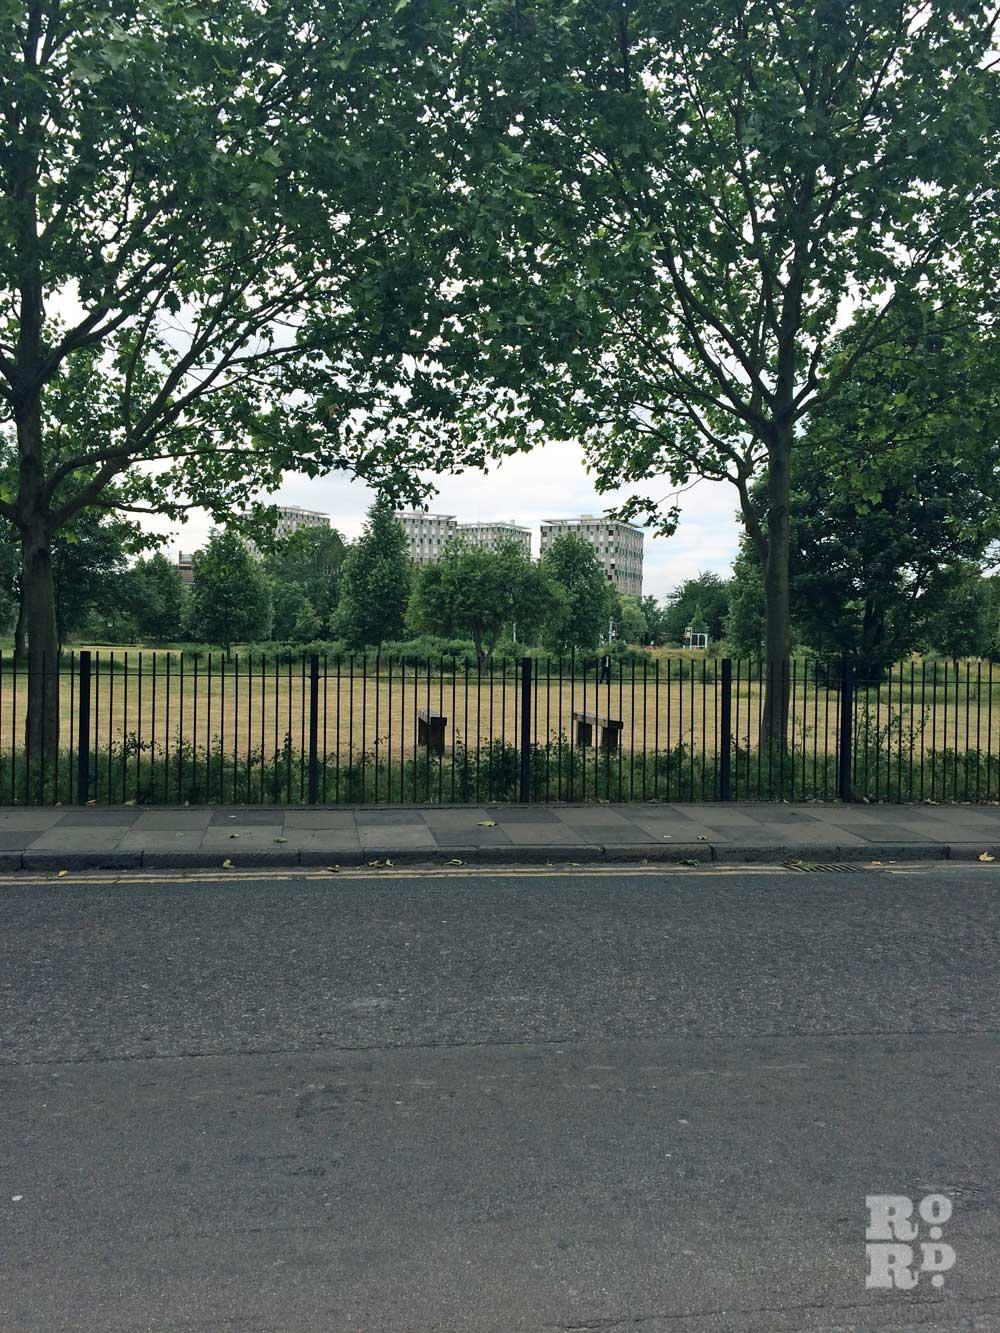 Wennington Green site where Rachel Whiteread's concrete house once stood